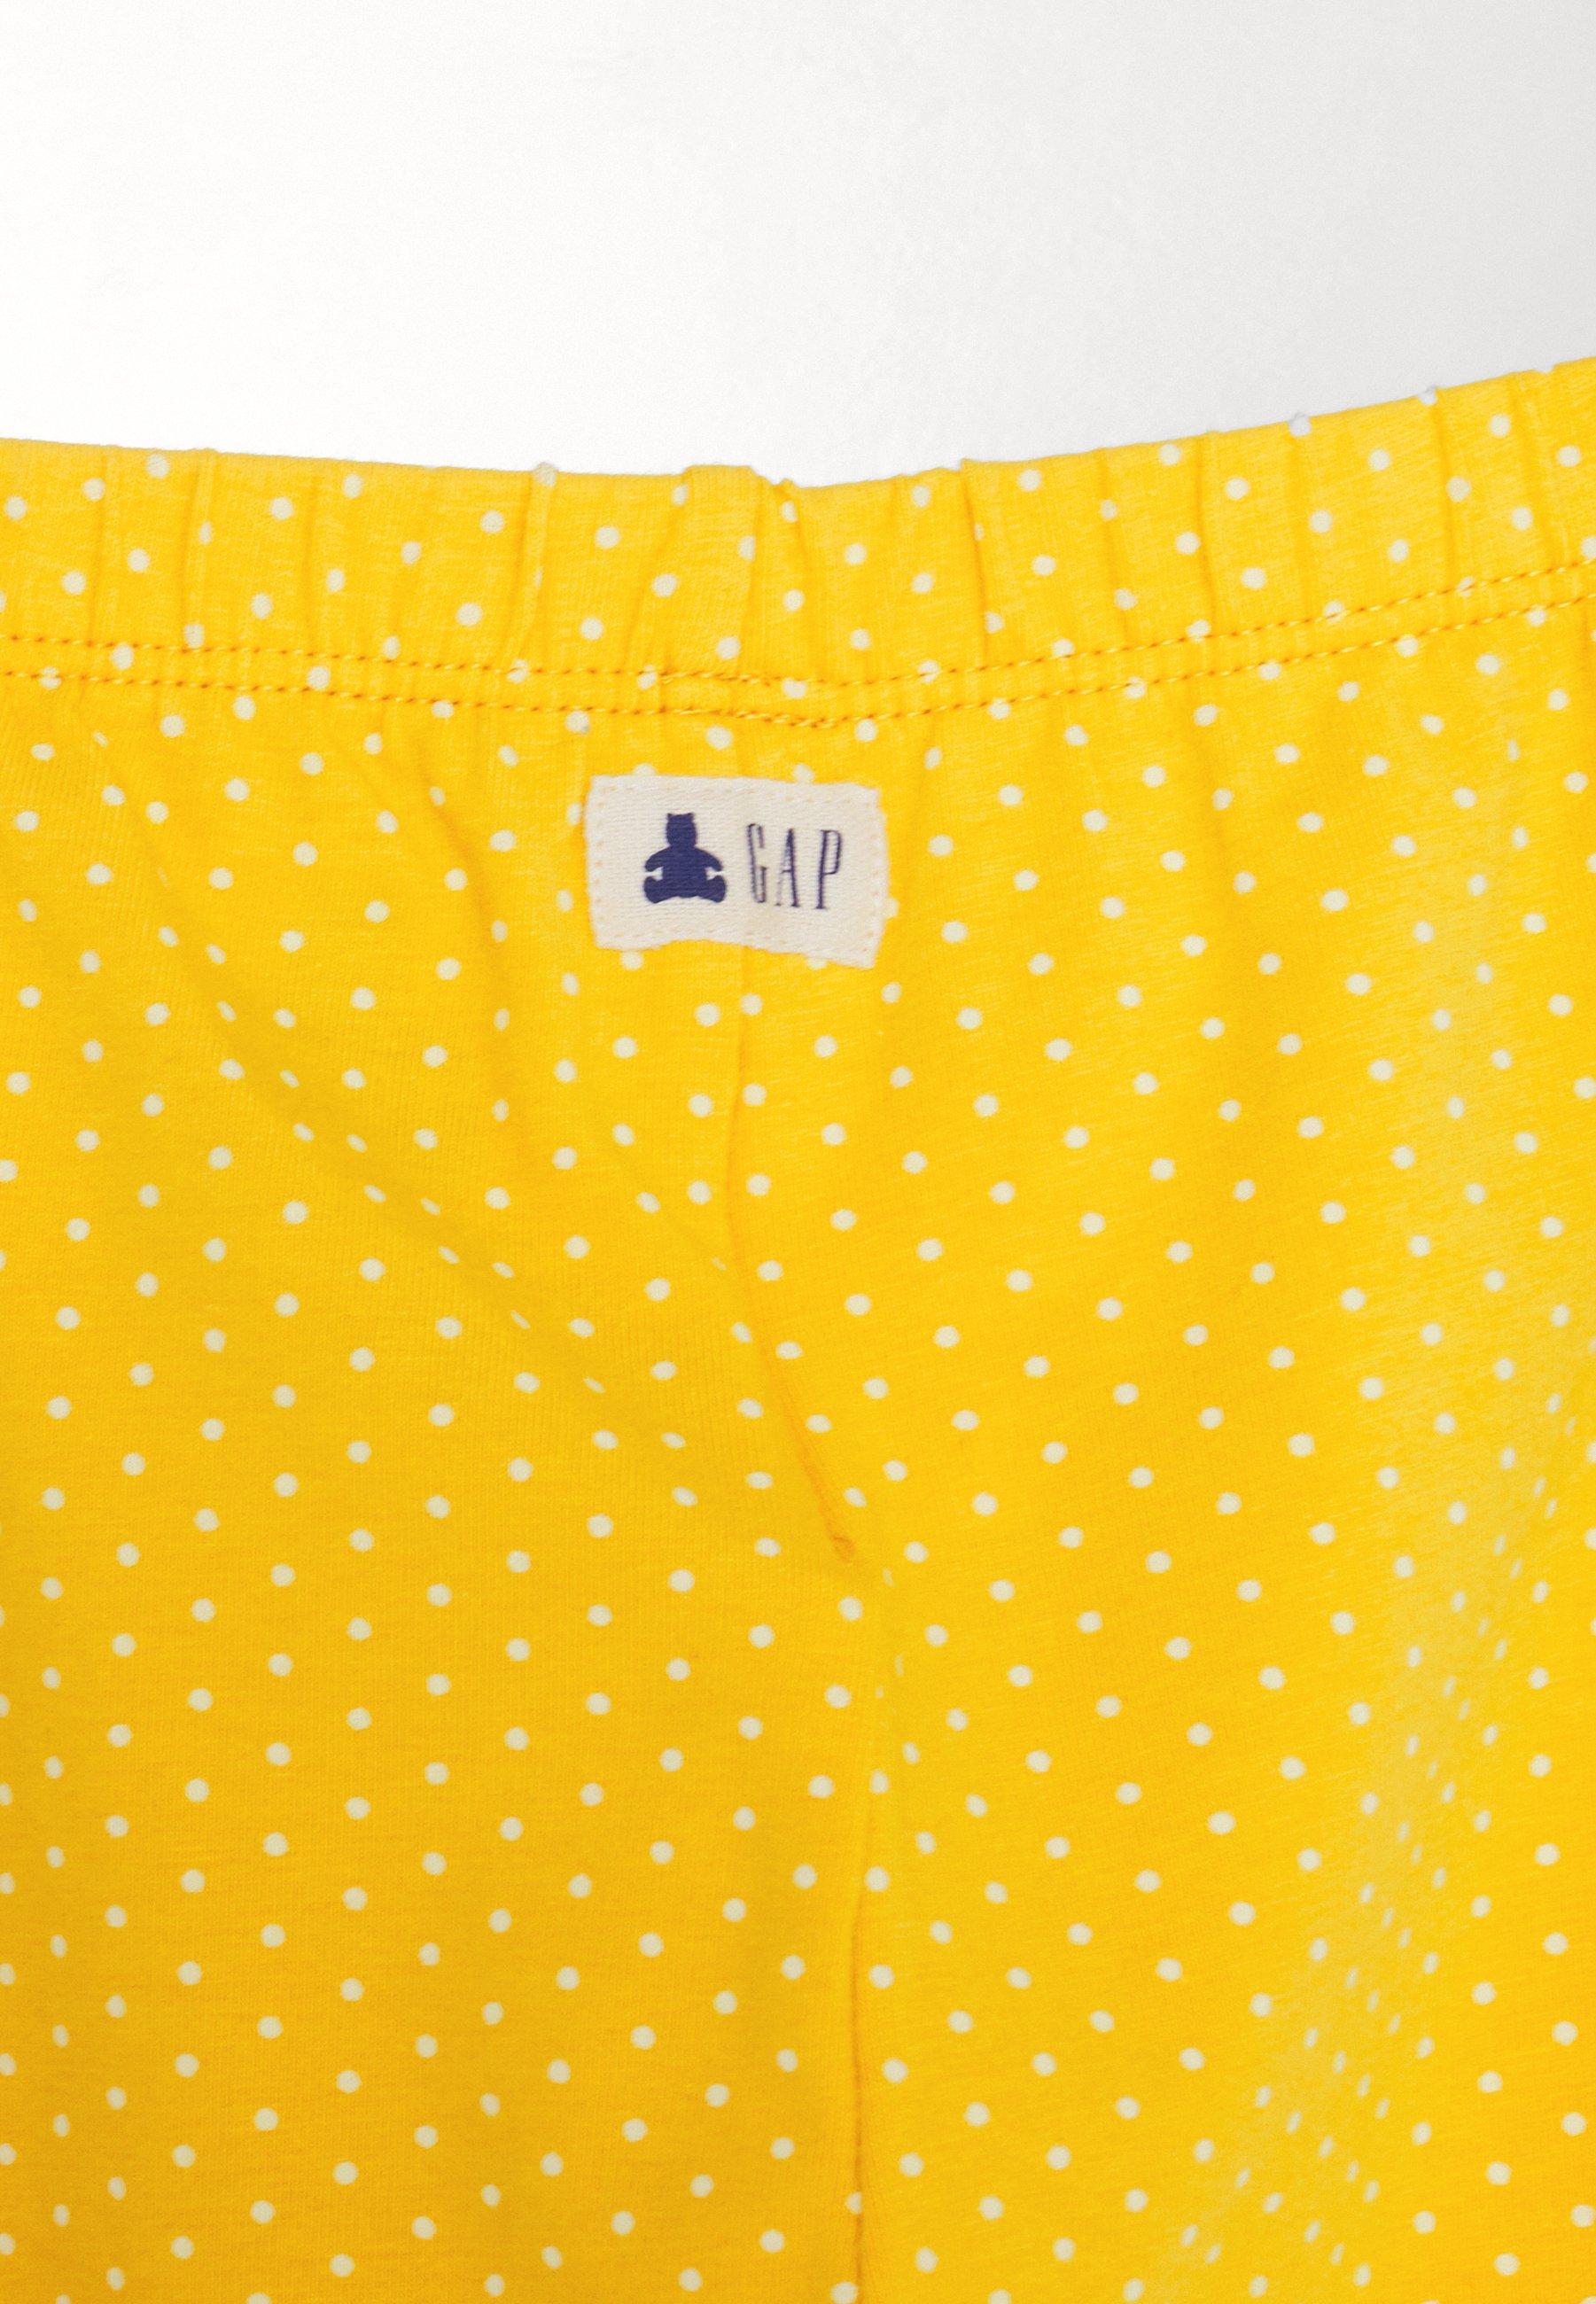 GAP Legginsy - yellow sundown - Ubranka dla dzieci